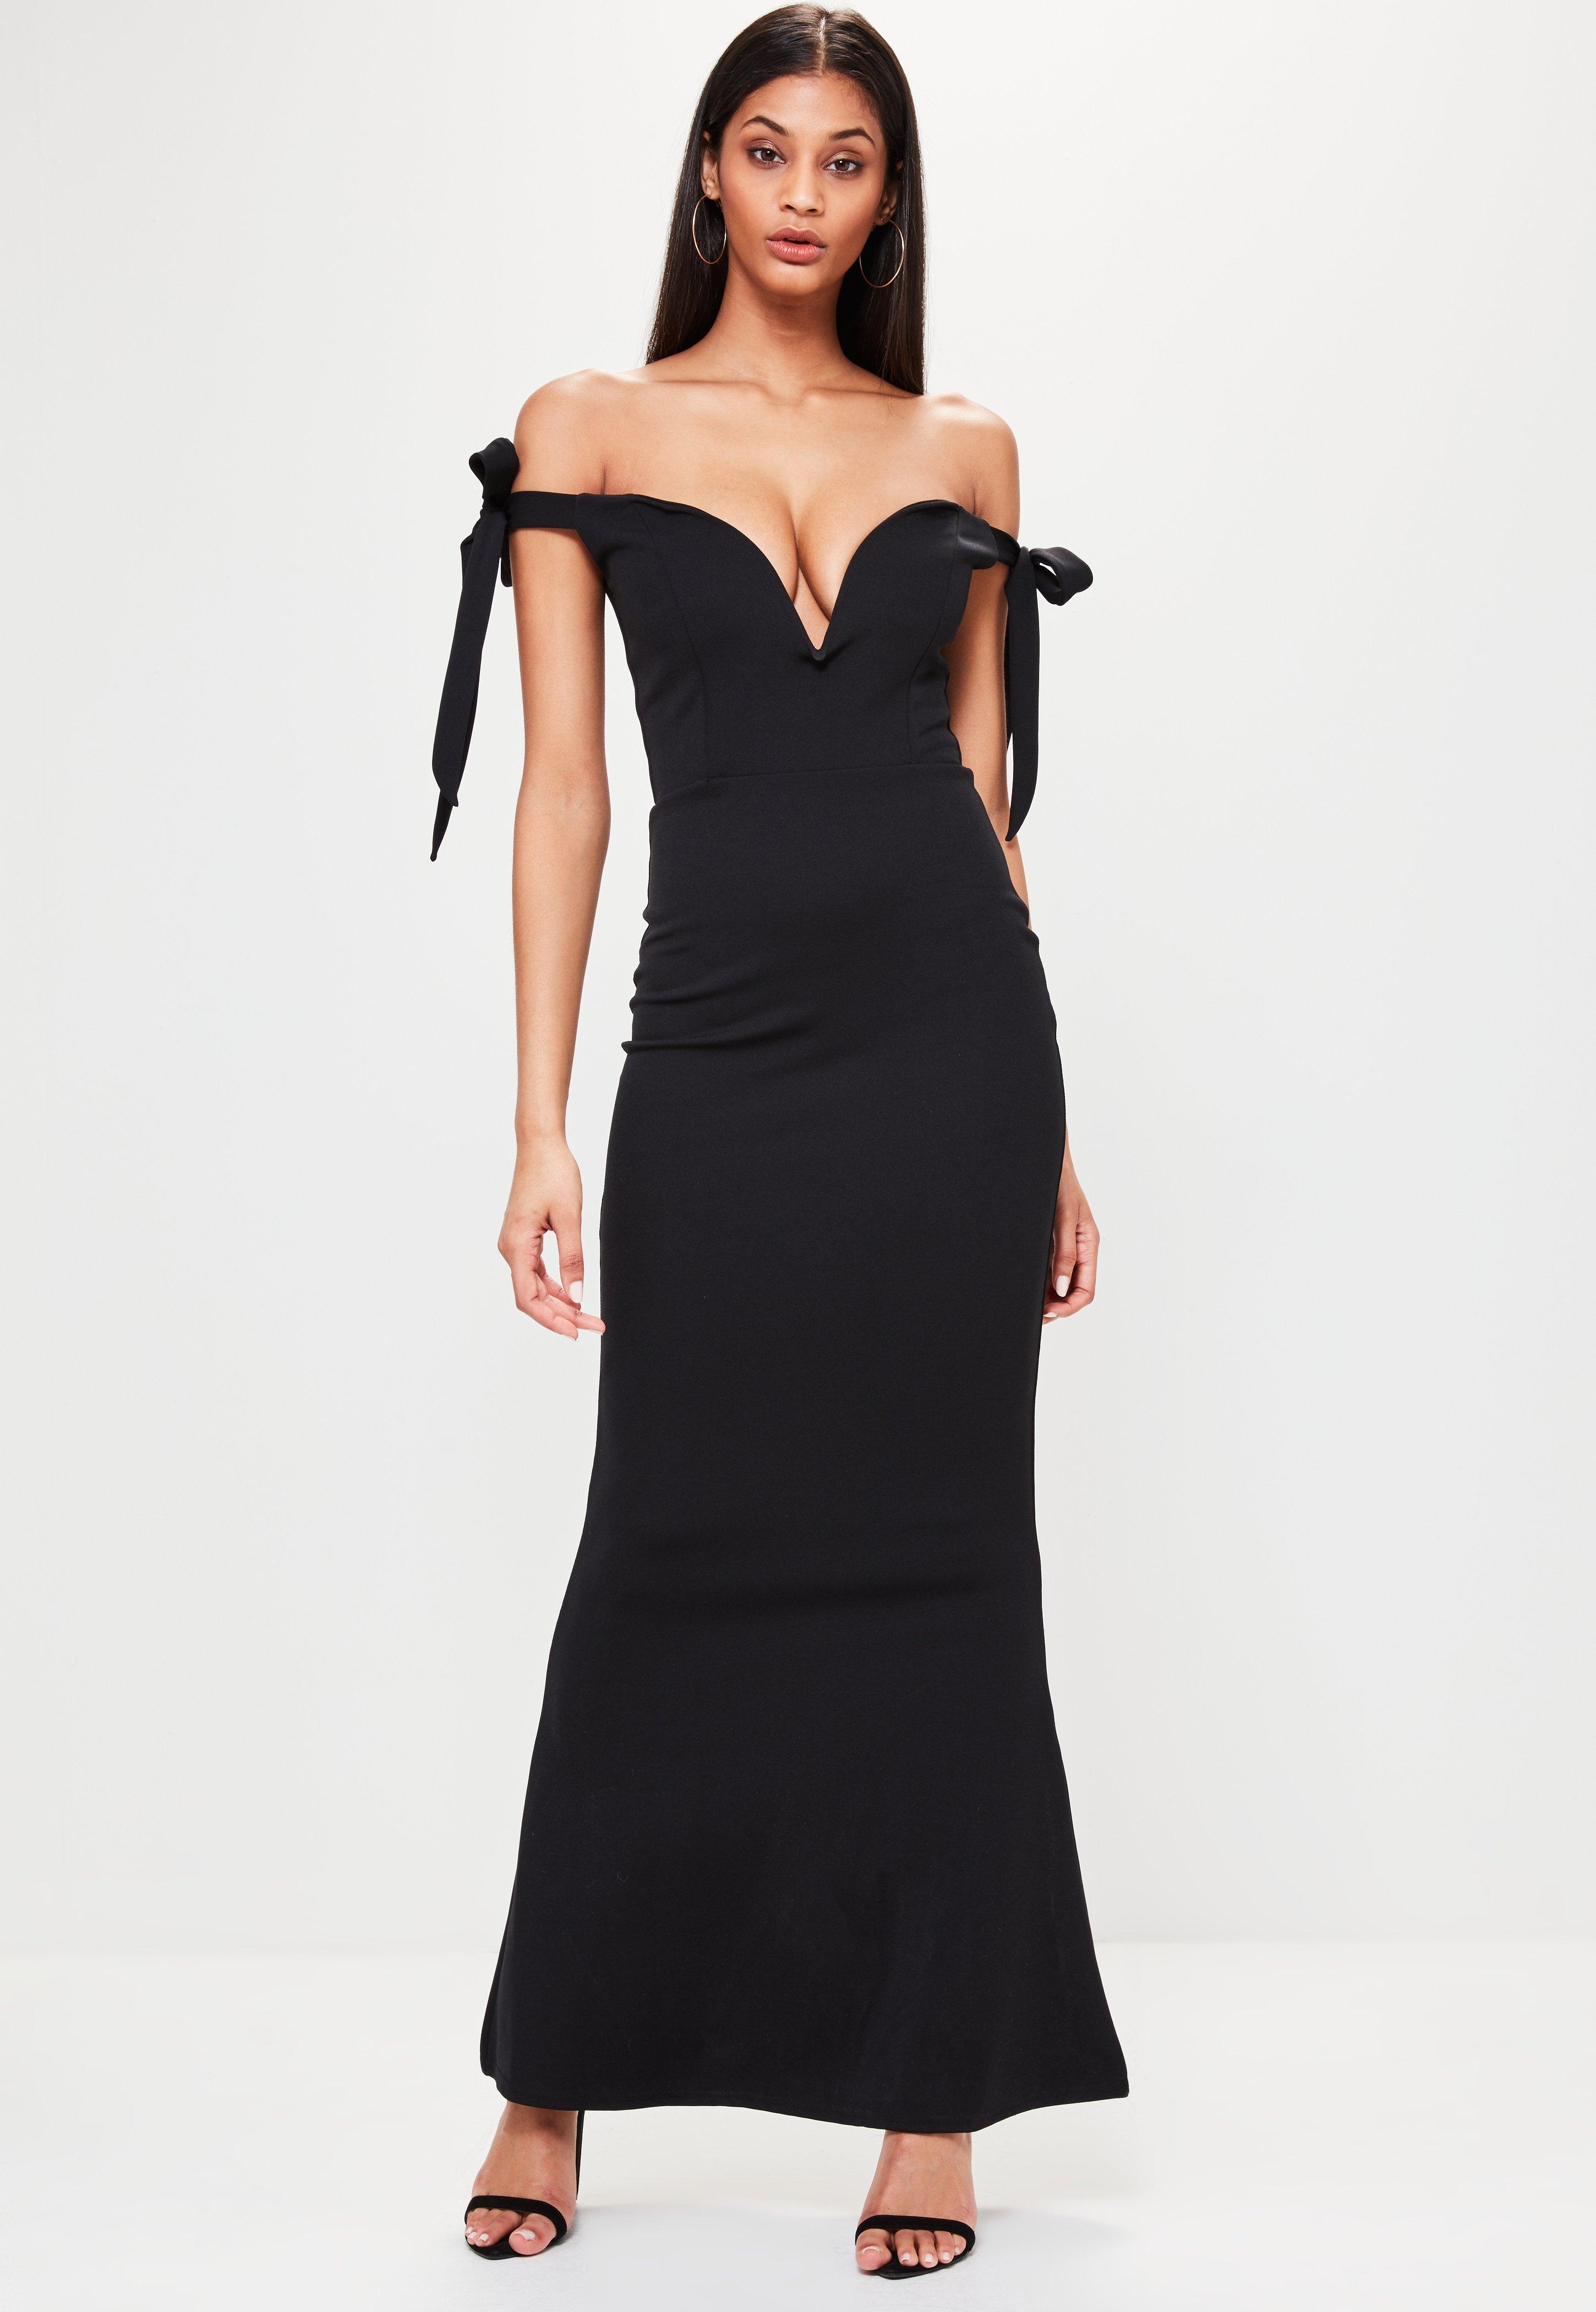 Missguided Black Sweetheart Neck Bardot Tie Maxi Dress in Black - Lyst